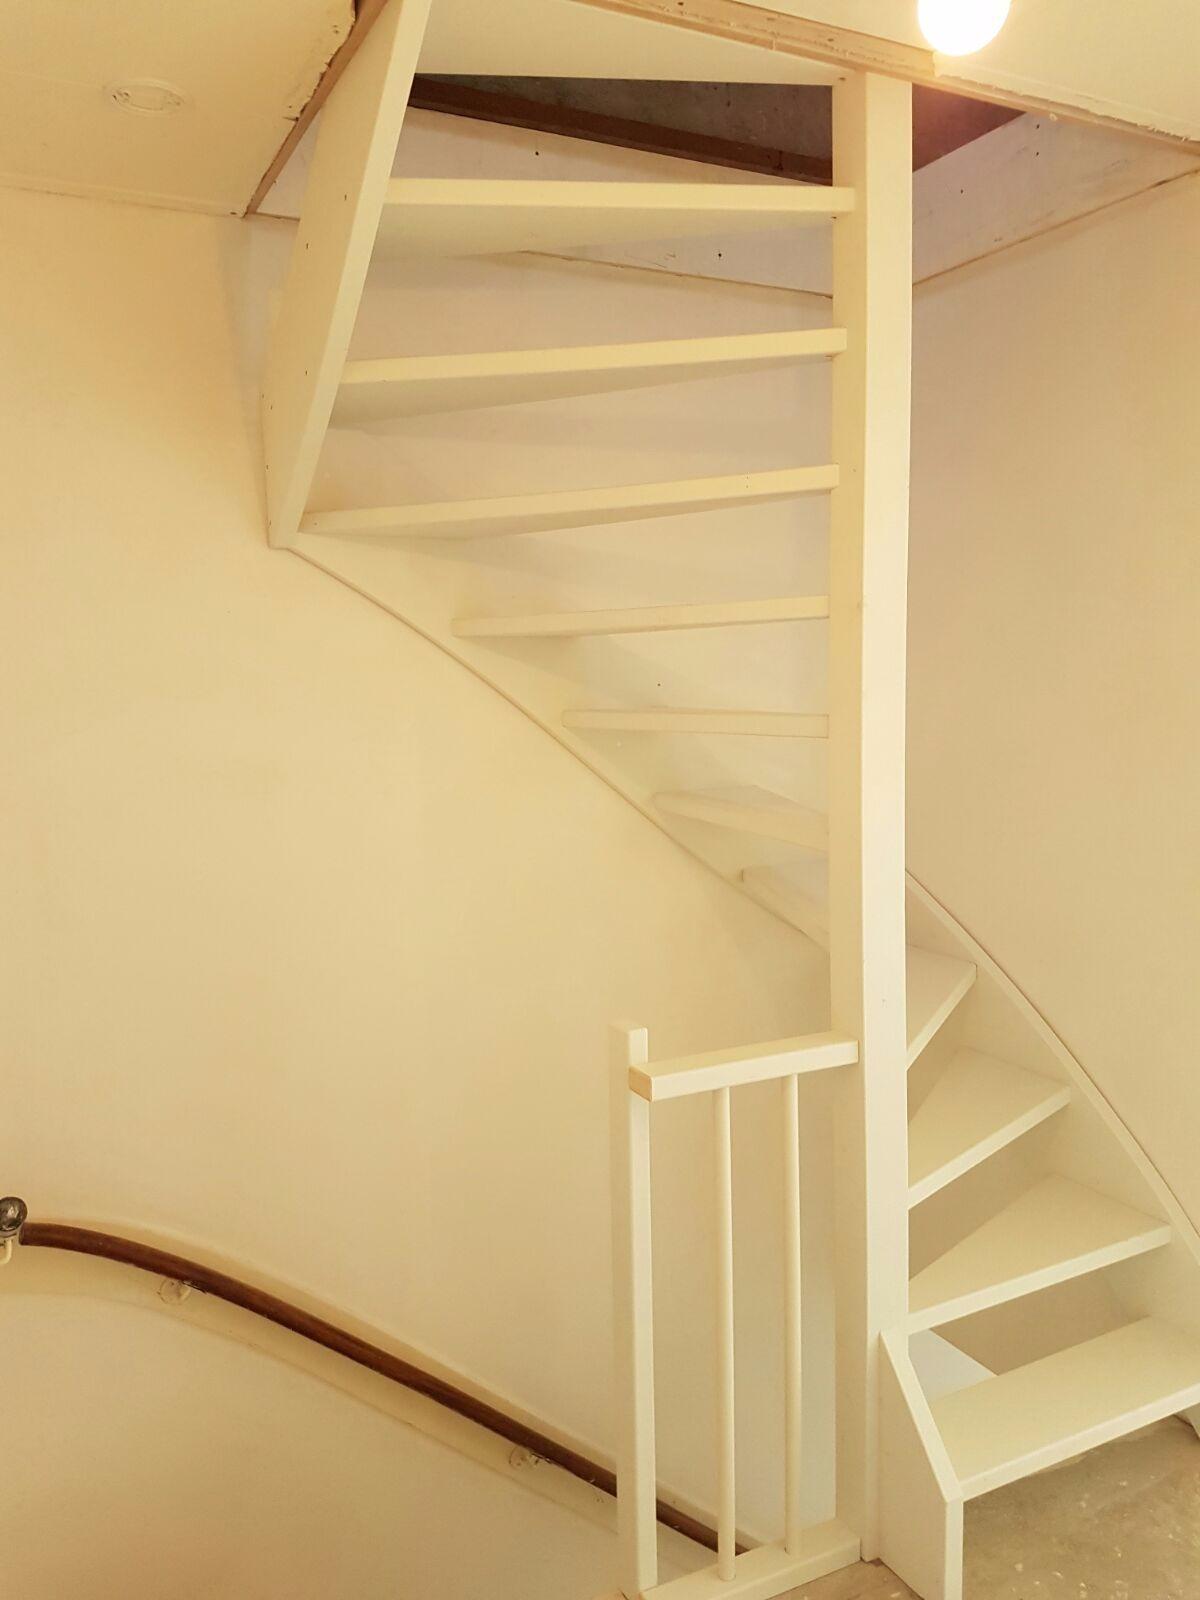 Soorten houten trappen modellen vlizotrap vervangen for 2 kwart trap